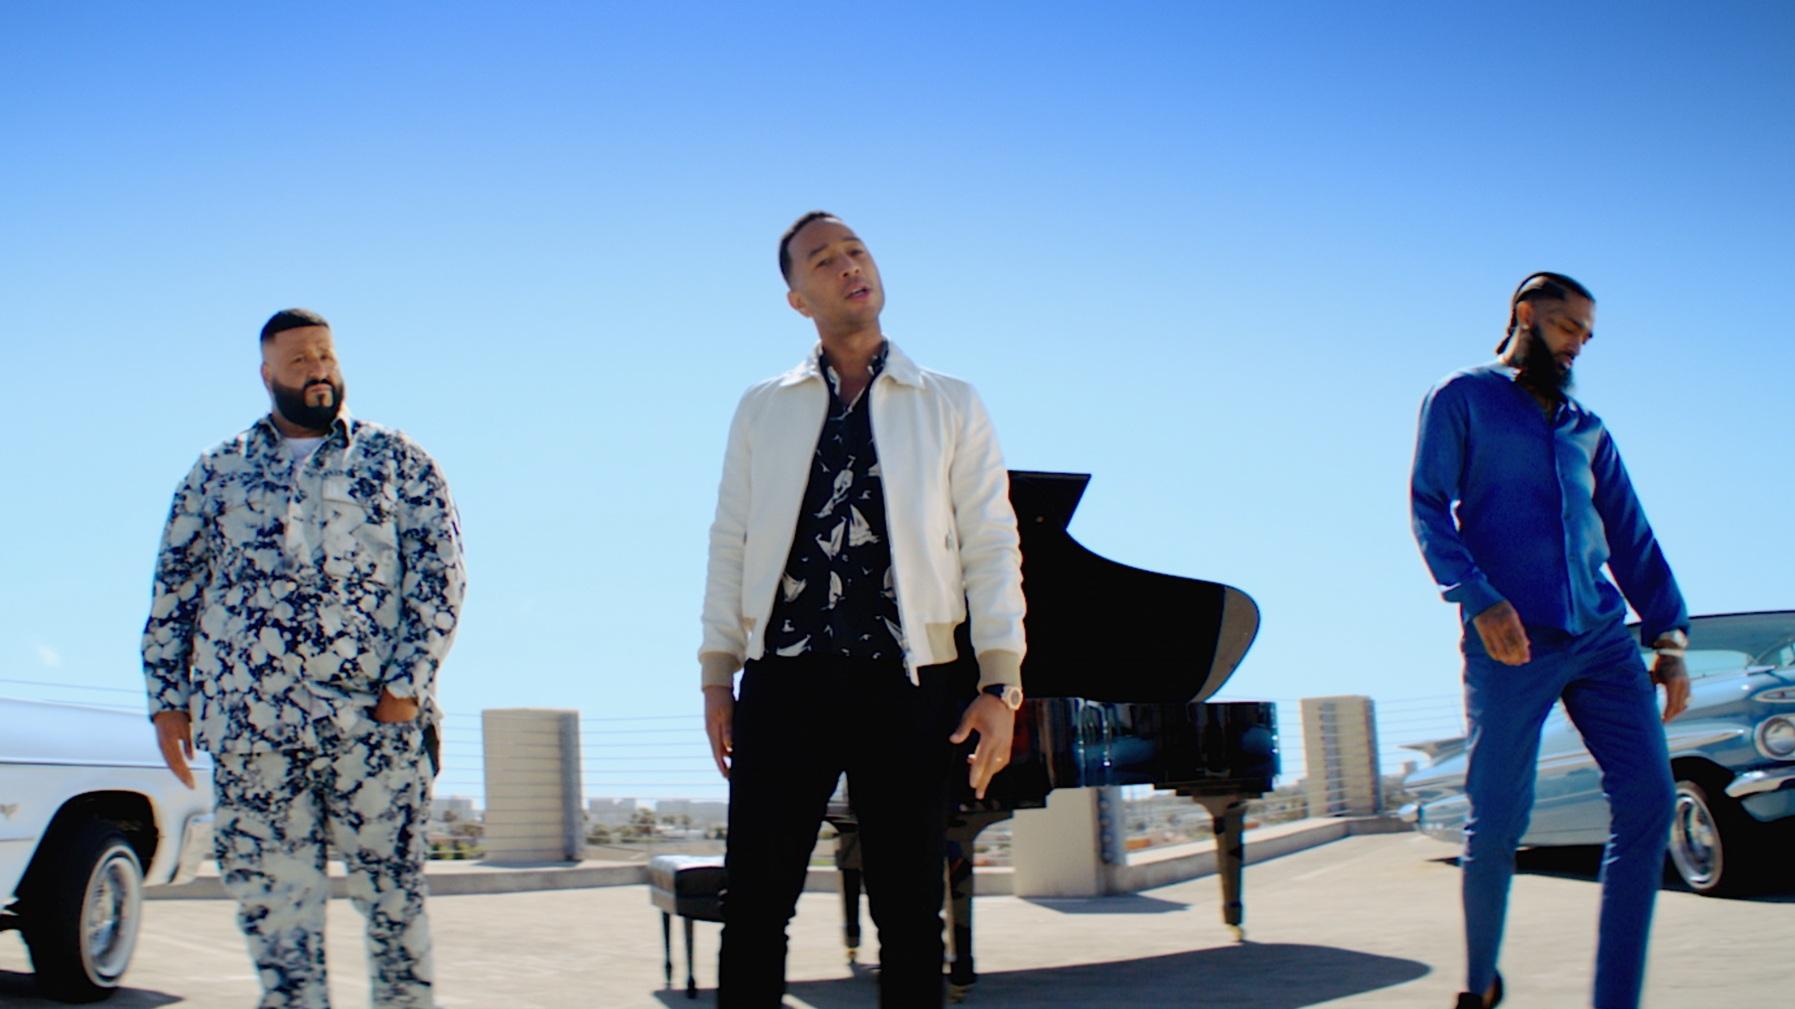 DJ KHALED X NIPSEY HUSSLE X JOHN LEGEND - 'Higher'